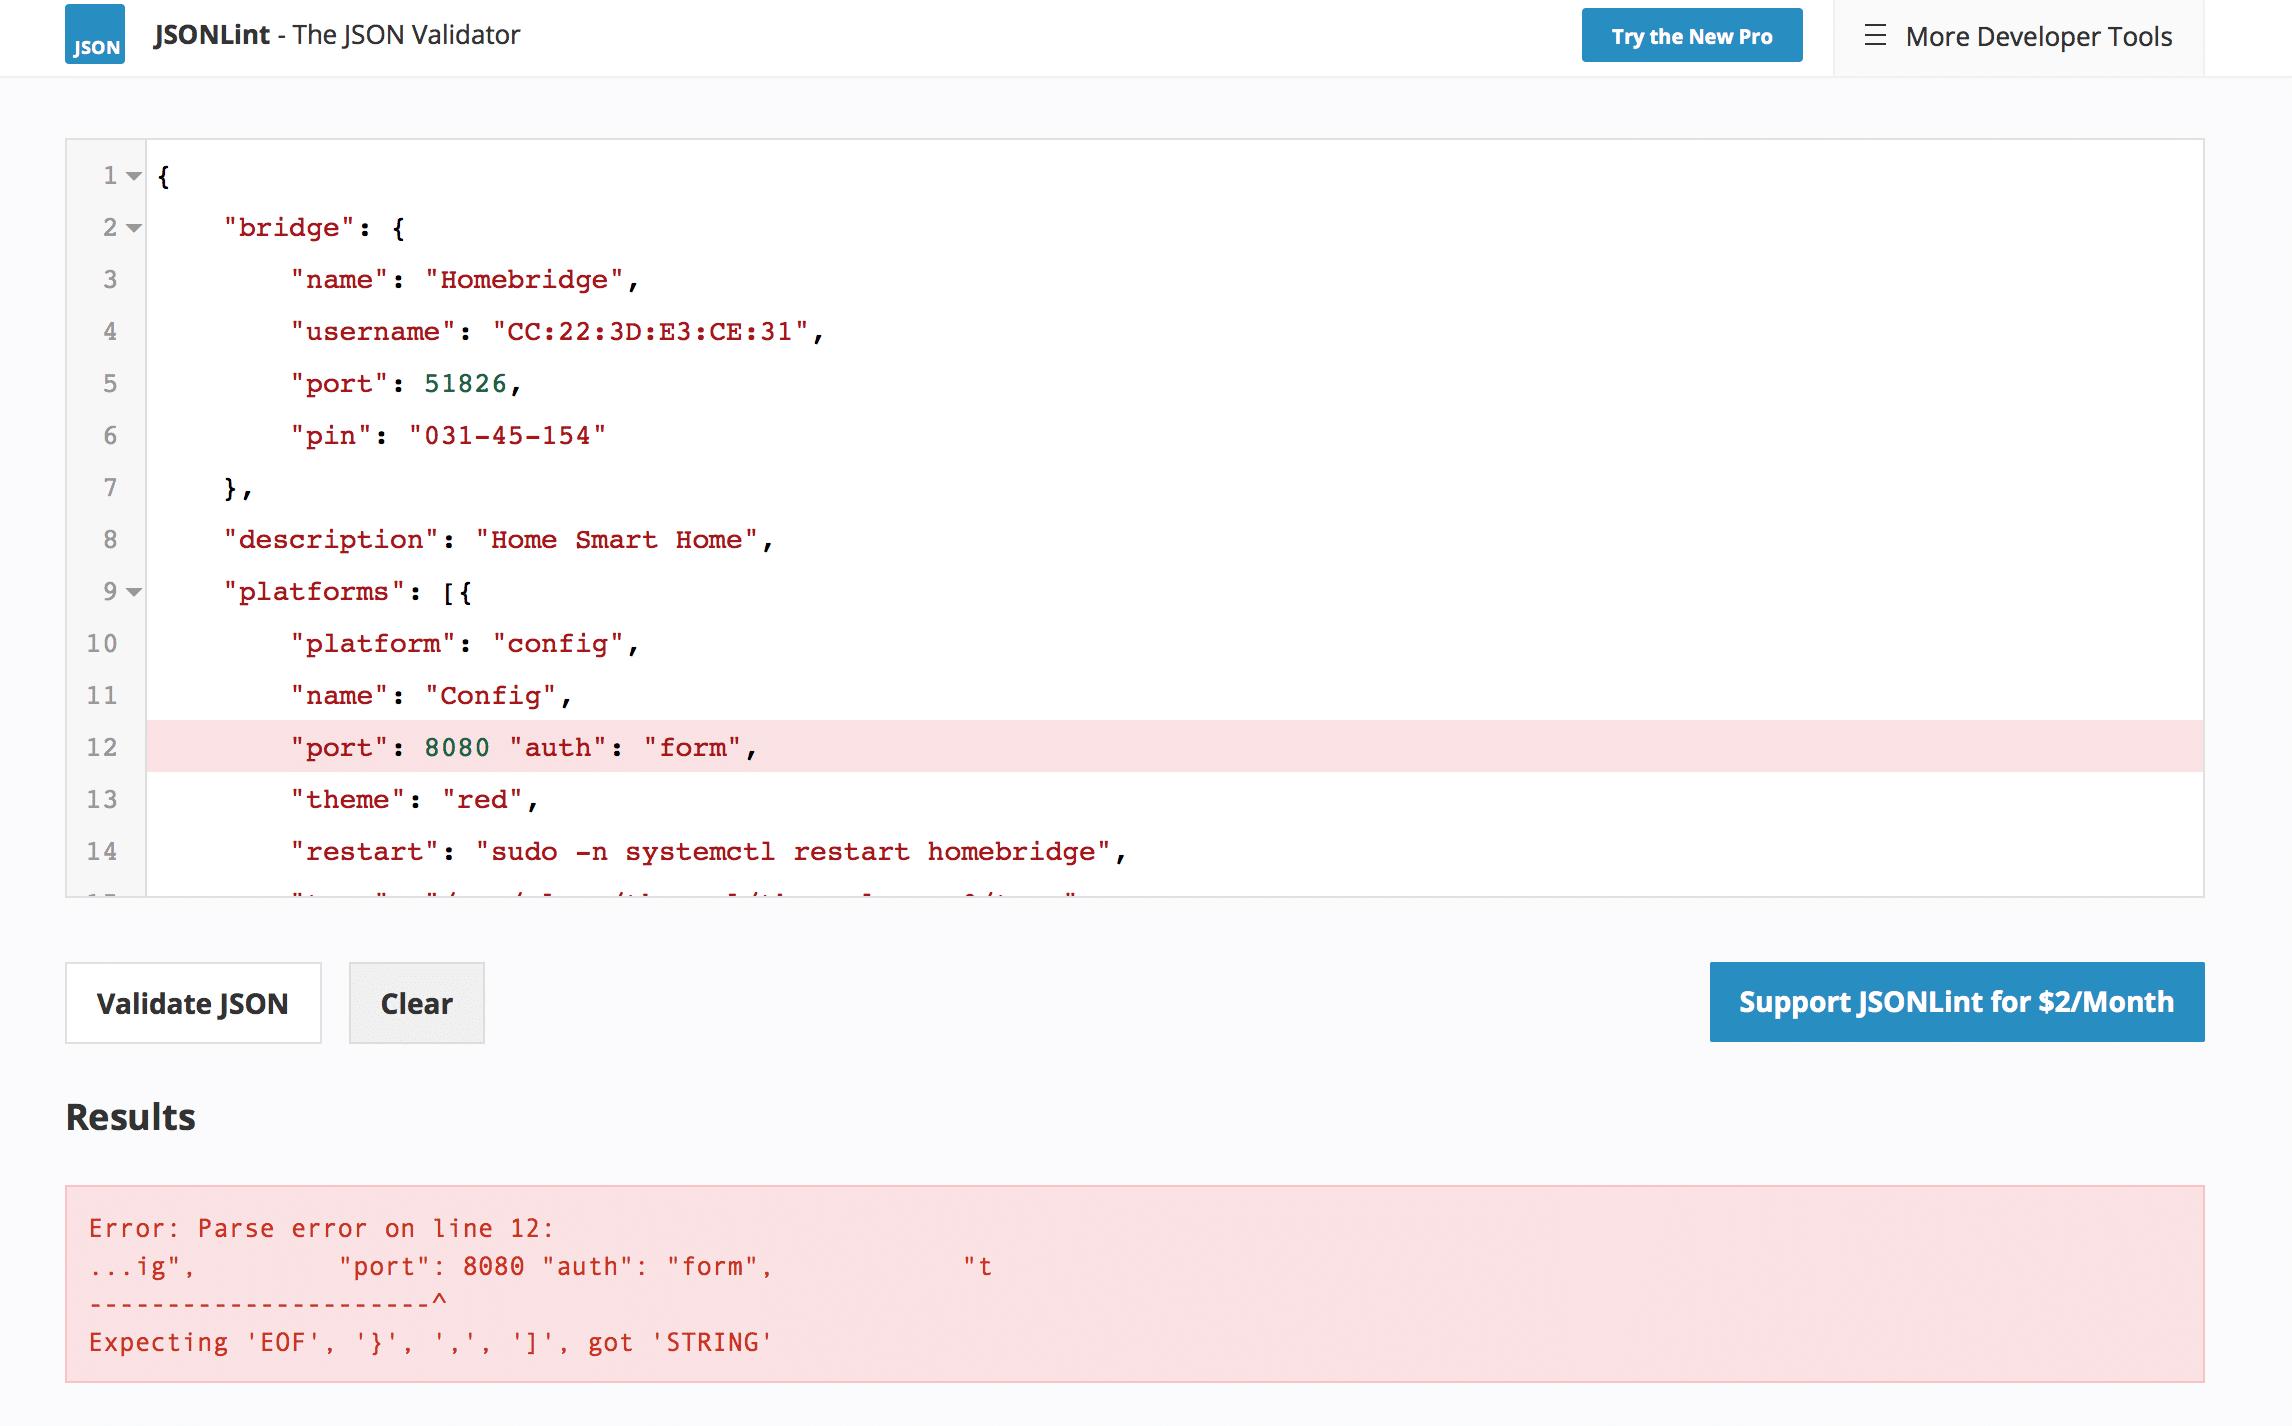 jsonlint.com validate